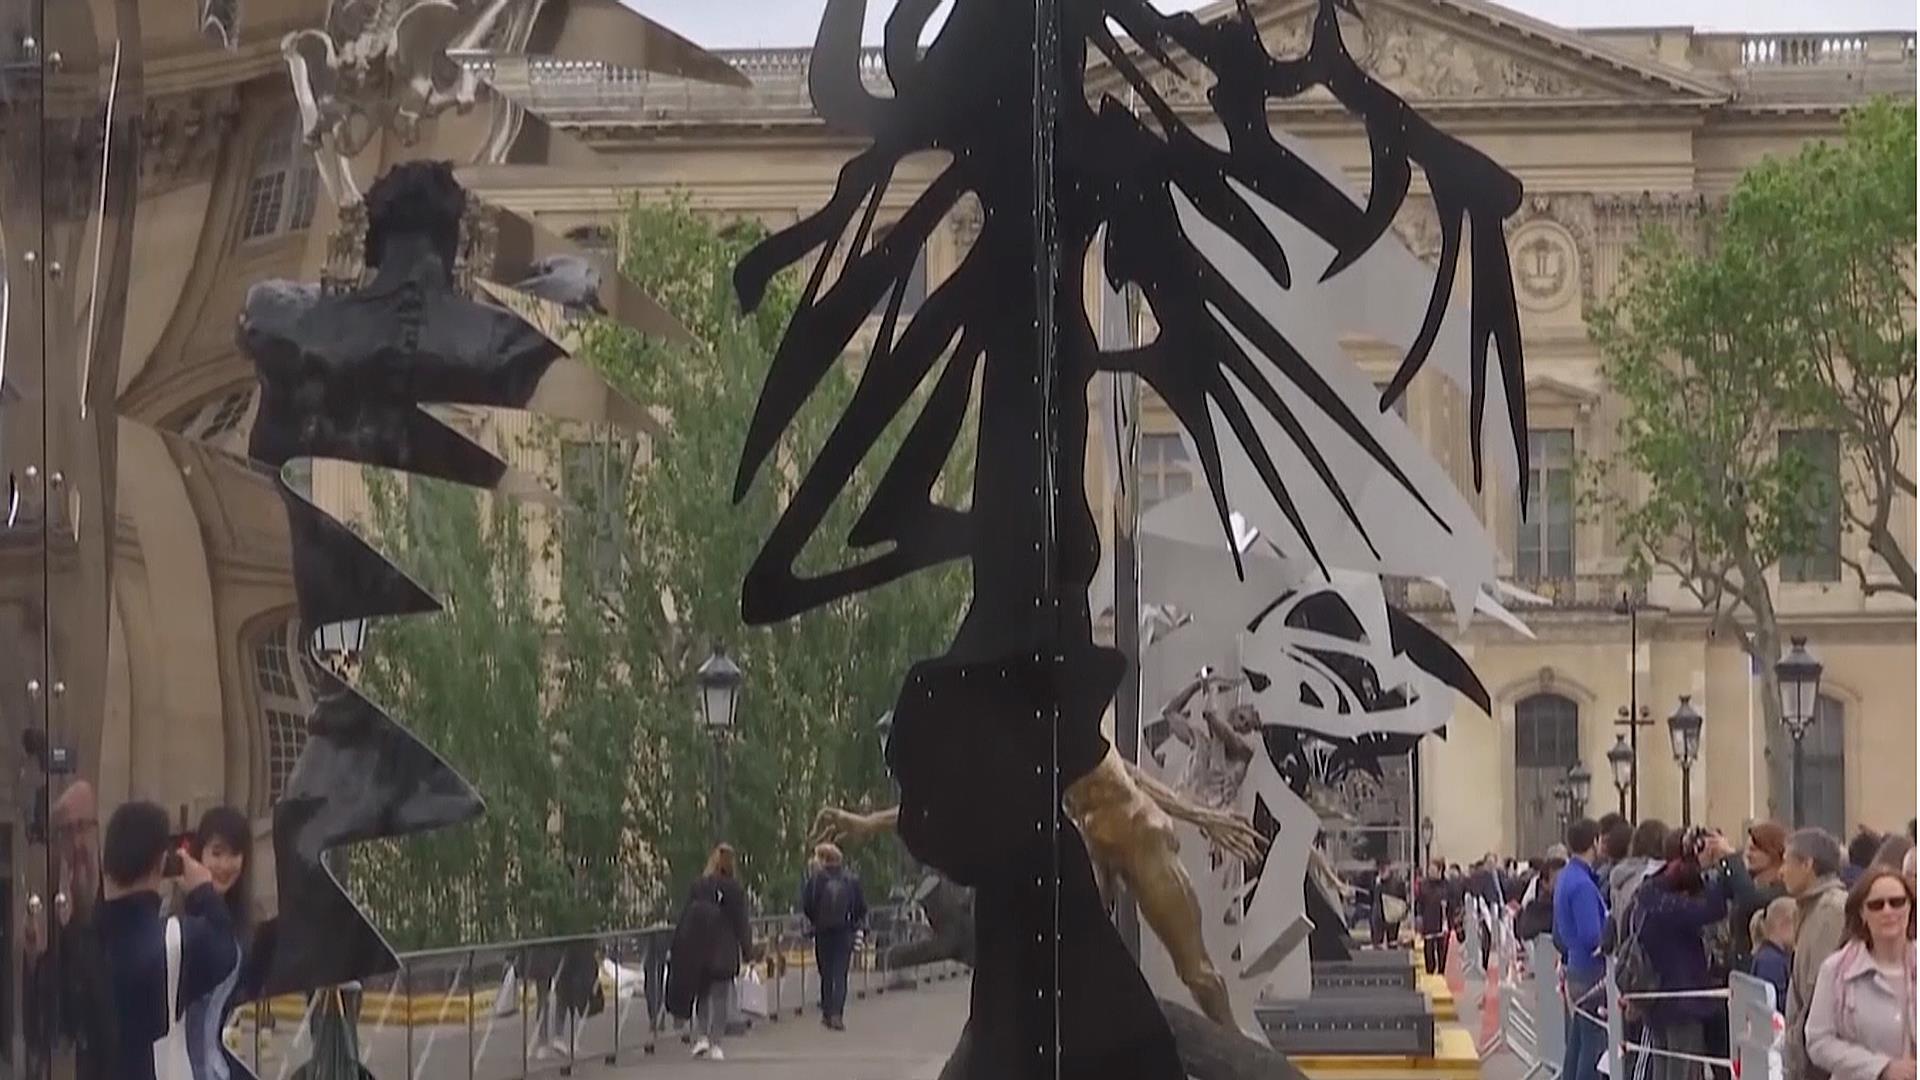 Paris Lovelocks Bridge Transformed into Sculpture Park